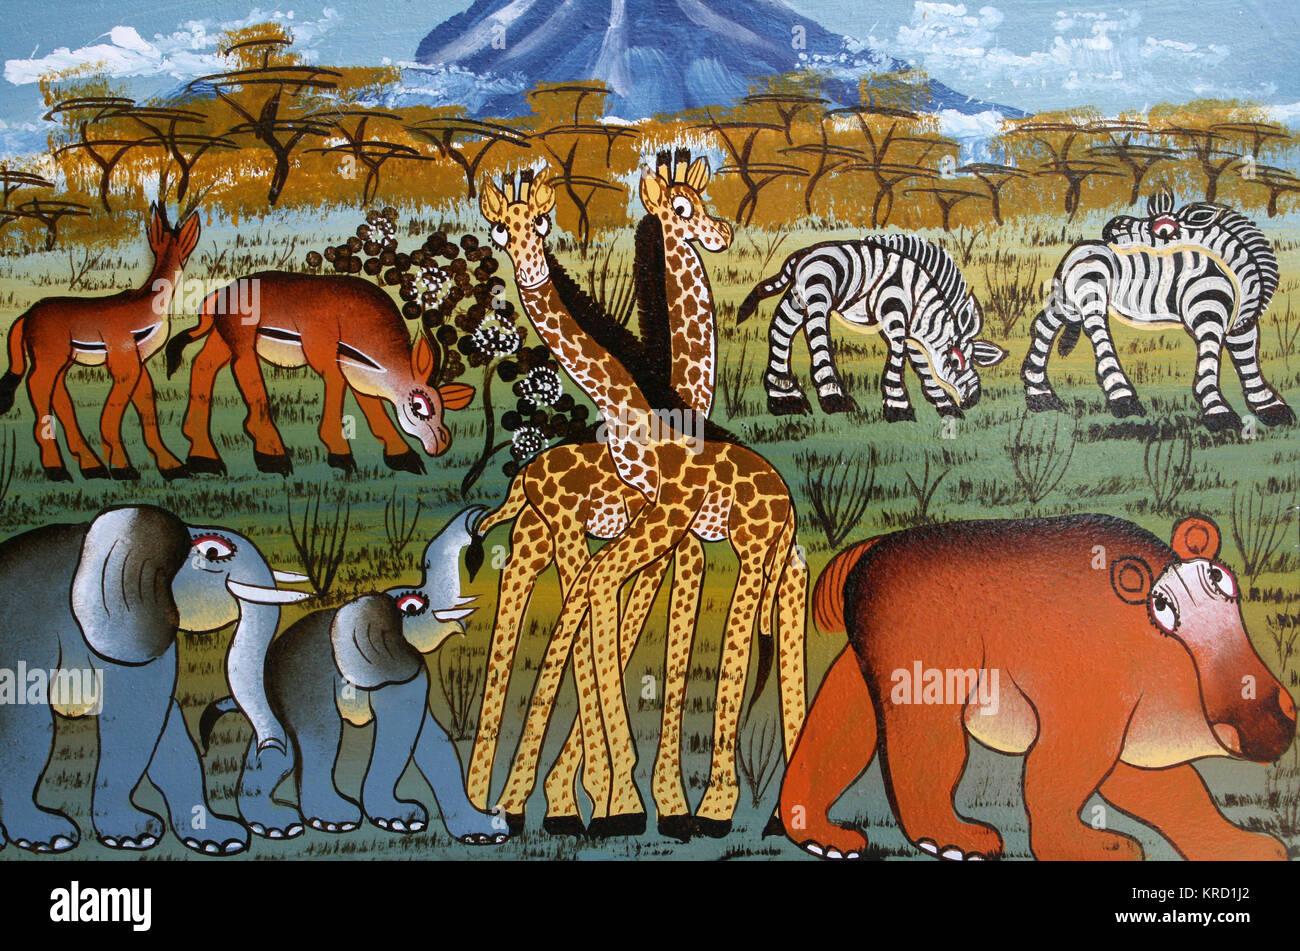 Tinga Tinga Painting Of African Safari Animals - Stock Image